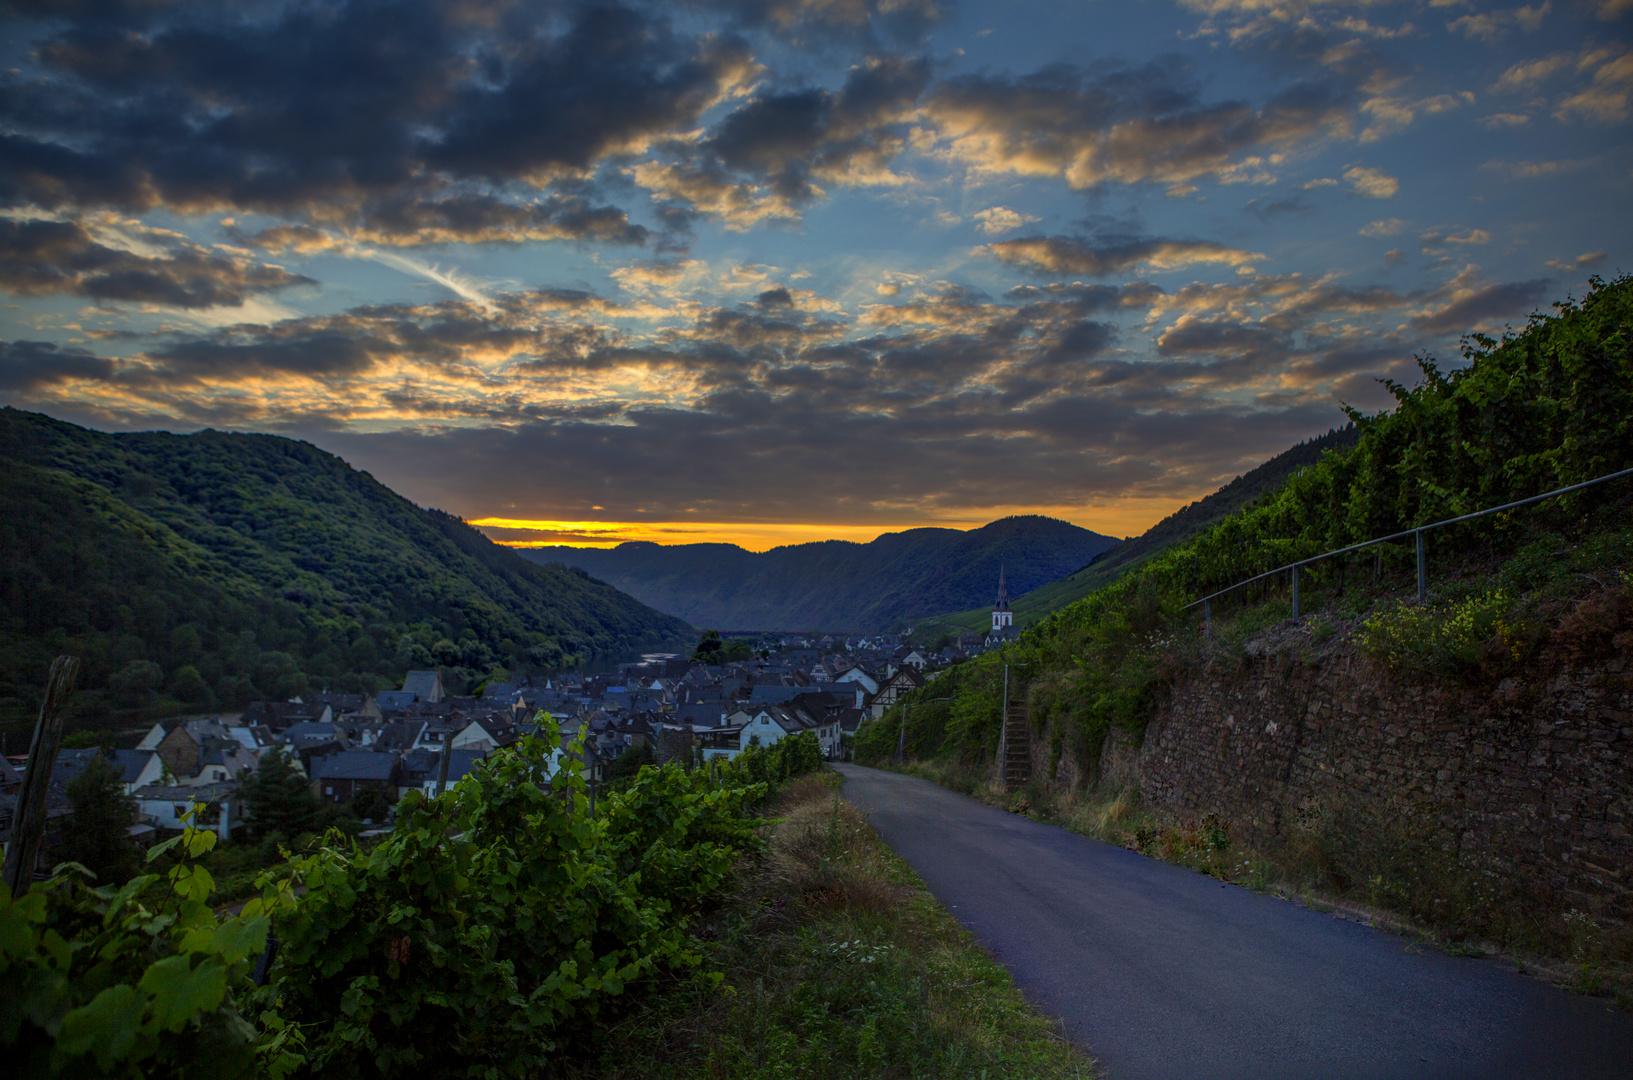 Sonnenuntergang in Ediger über dem Calmont